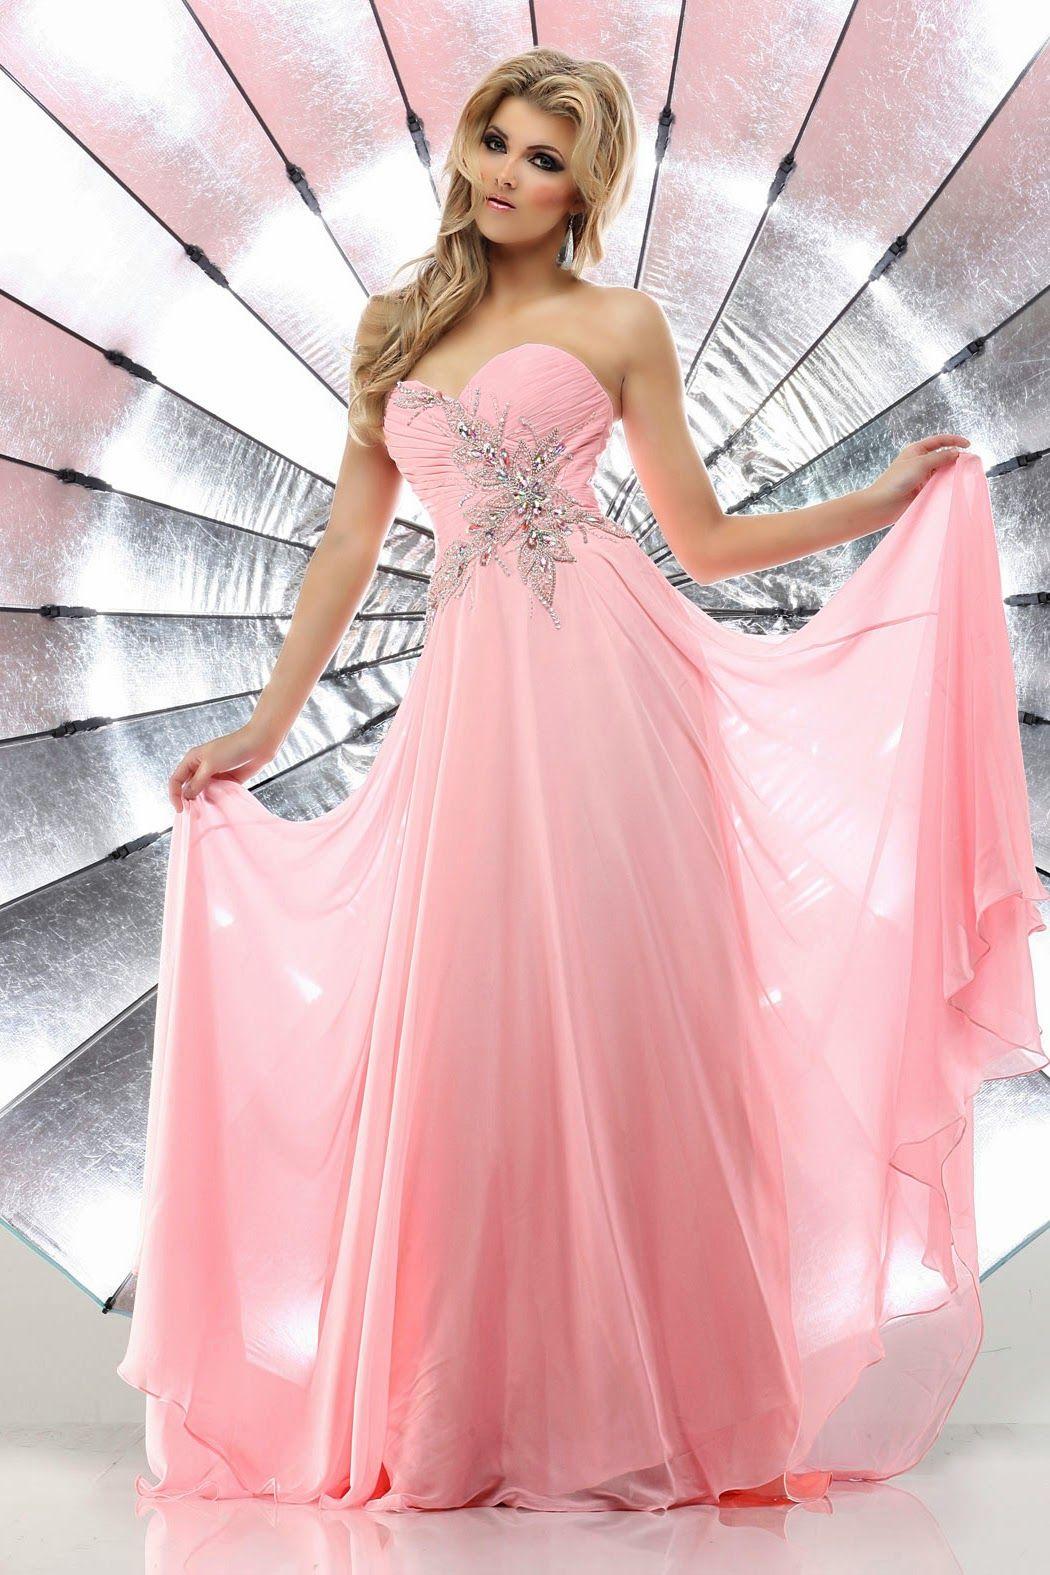 Modest wedding dresses under 200  Pink Prom Dress   Best Fashion Dresses  Pinterest  Prom dress